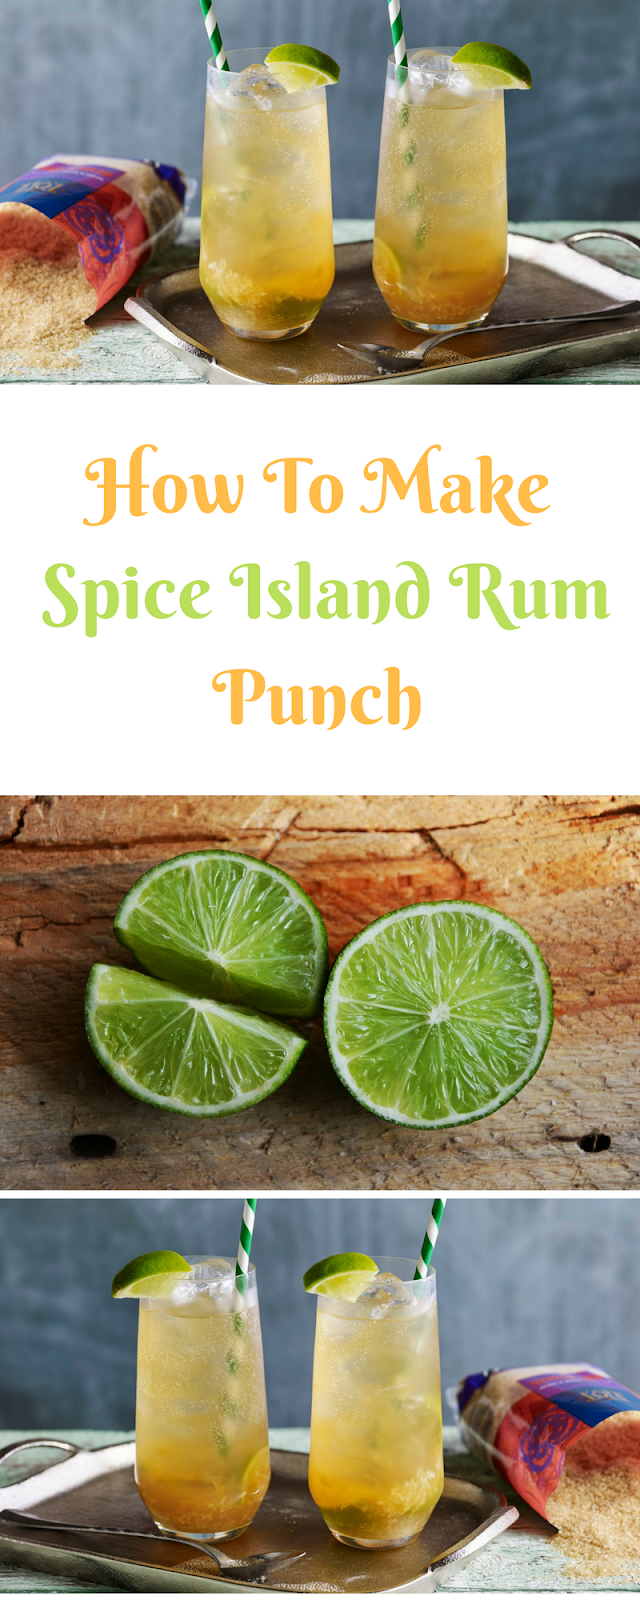 Spice Island Rum Punch